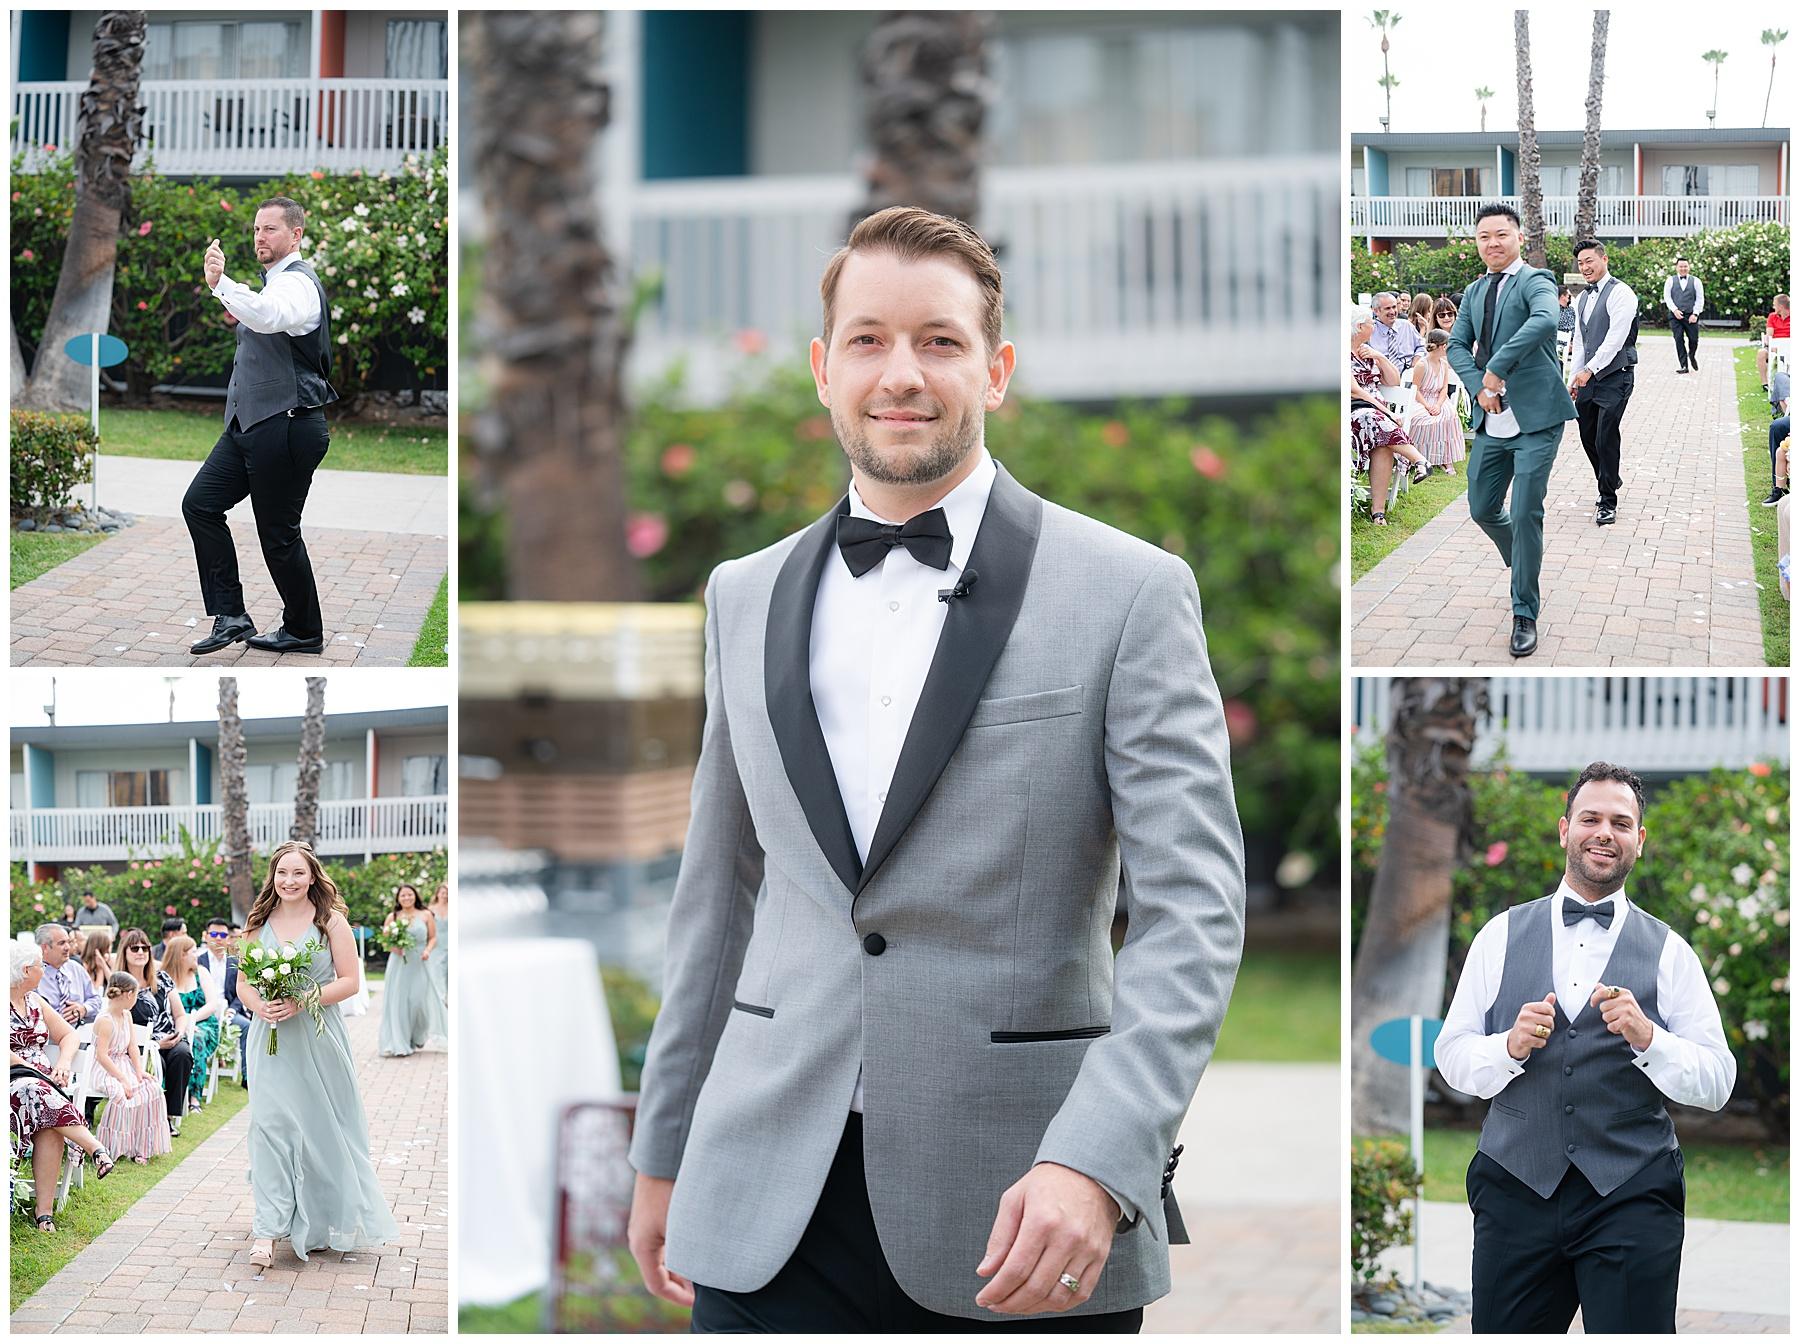 silly wedding processional